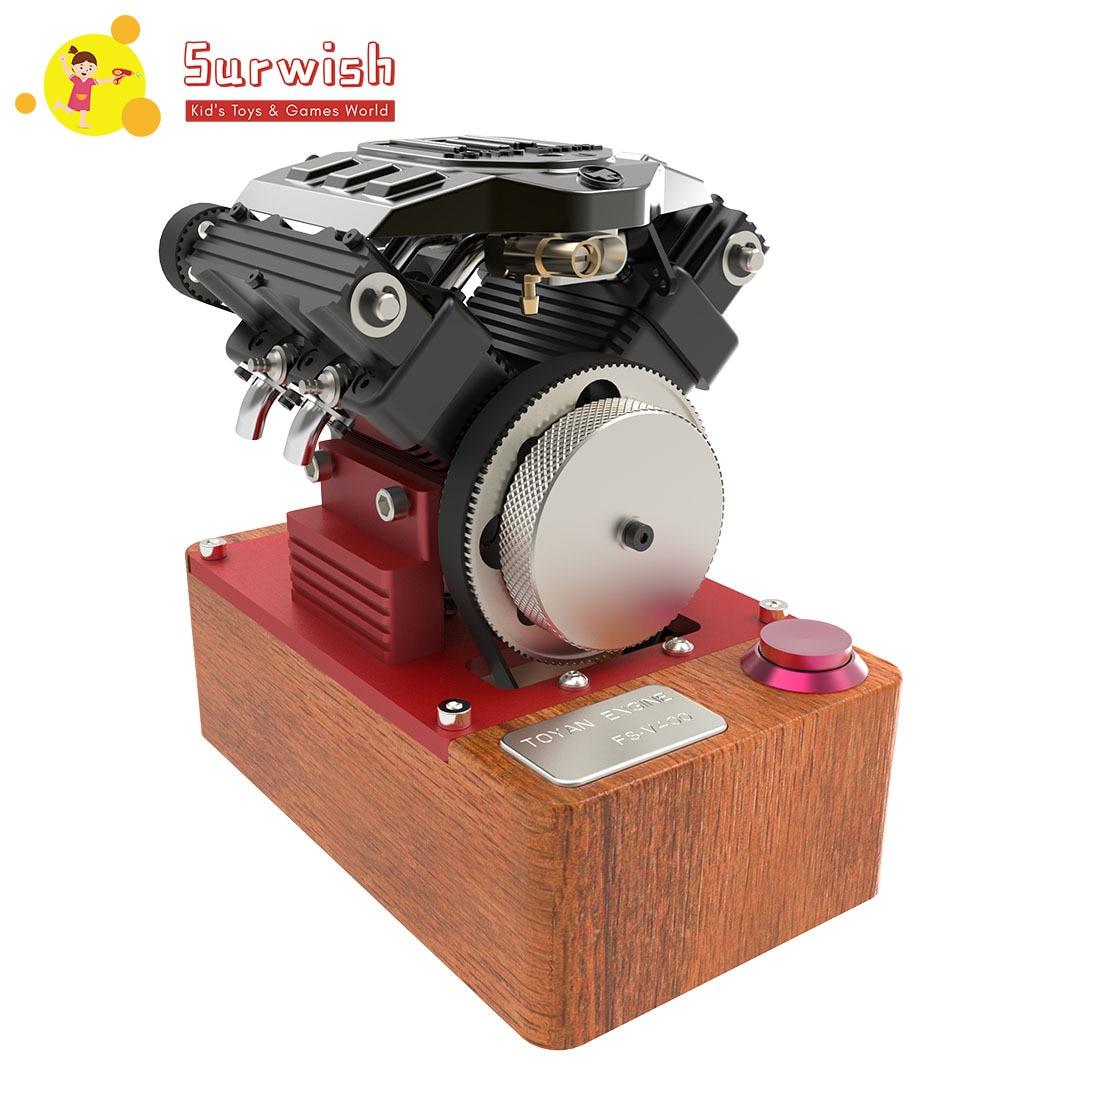 TOYAN V4 Engine 4 Cylinder Four Stroke Gasoline Engine FS-4100GA Full Edition Engine Without CDI And Spark Plug